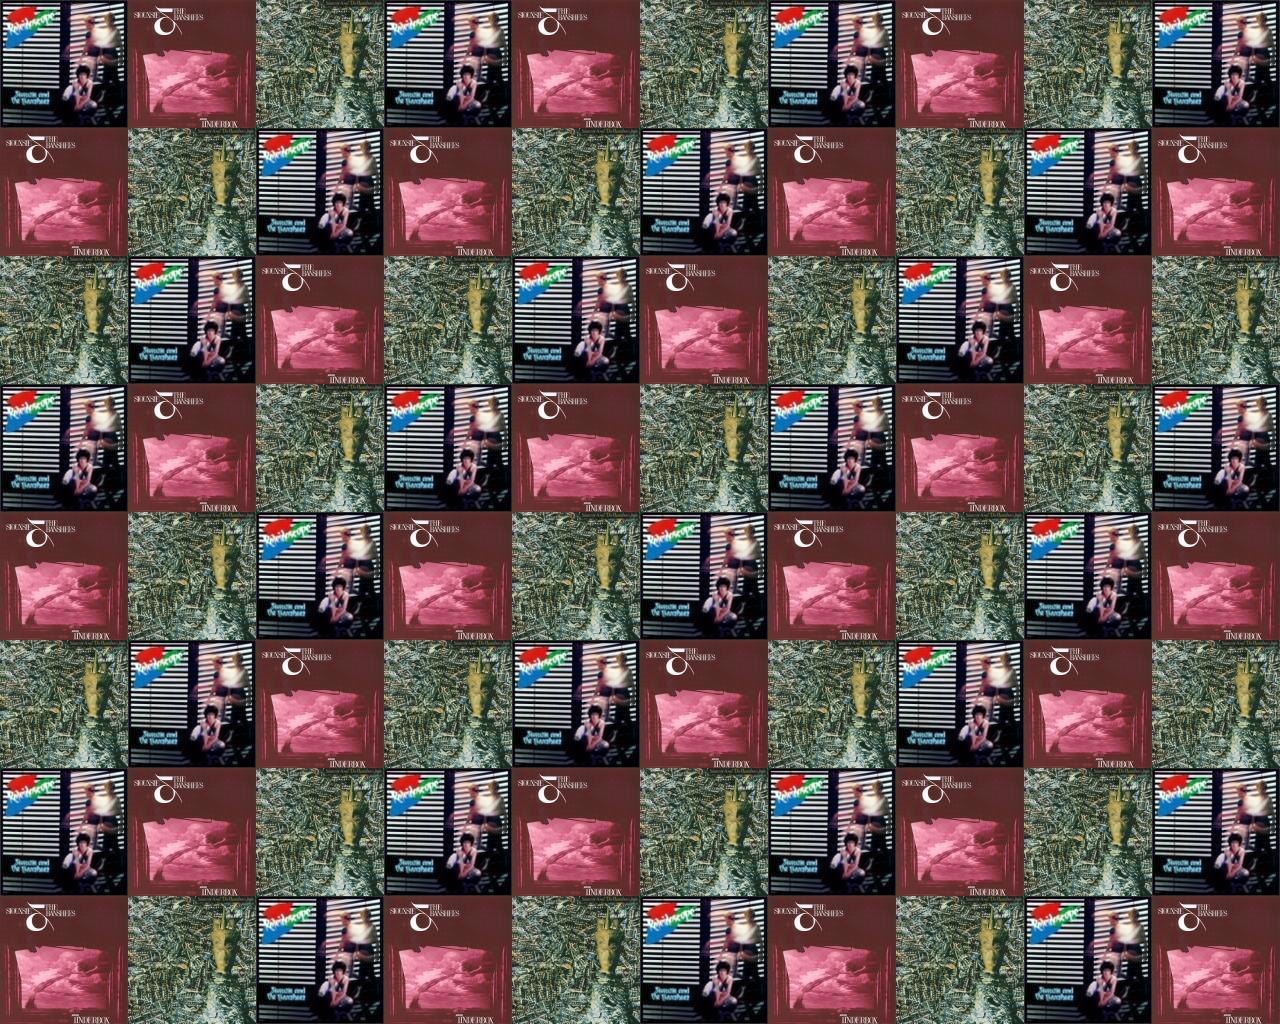 Siouxsie And The Banshees Kaleidoscope Tinderbox Juju Wallpaper